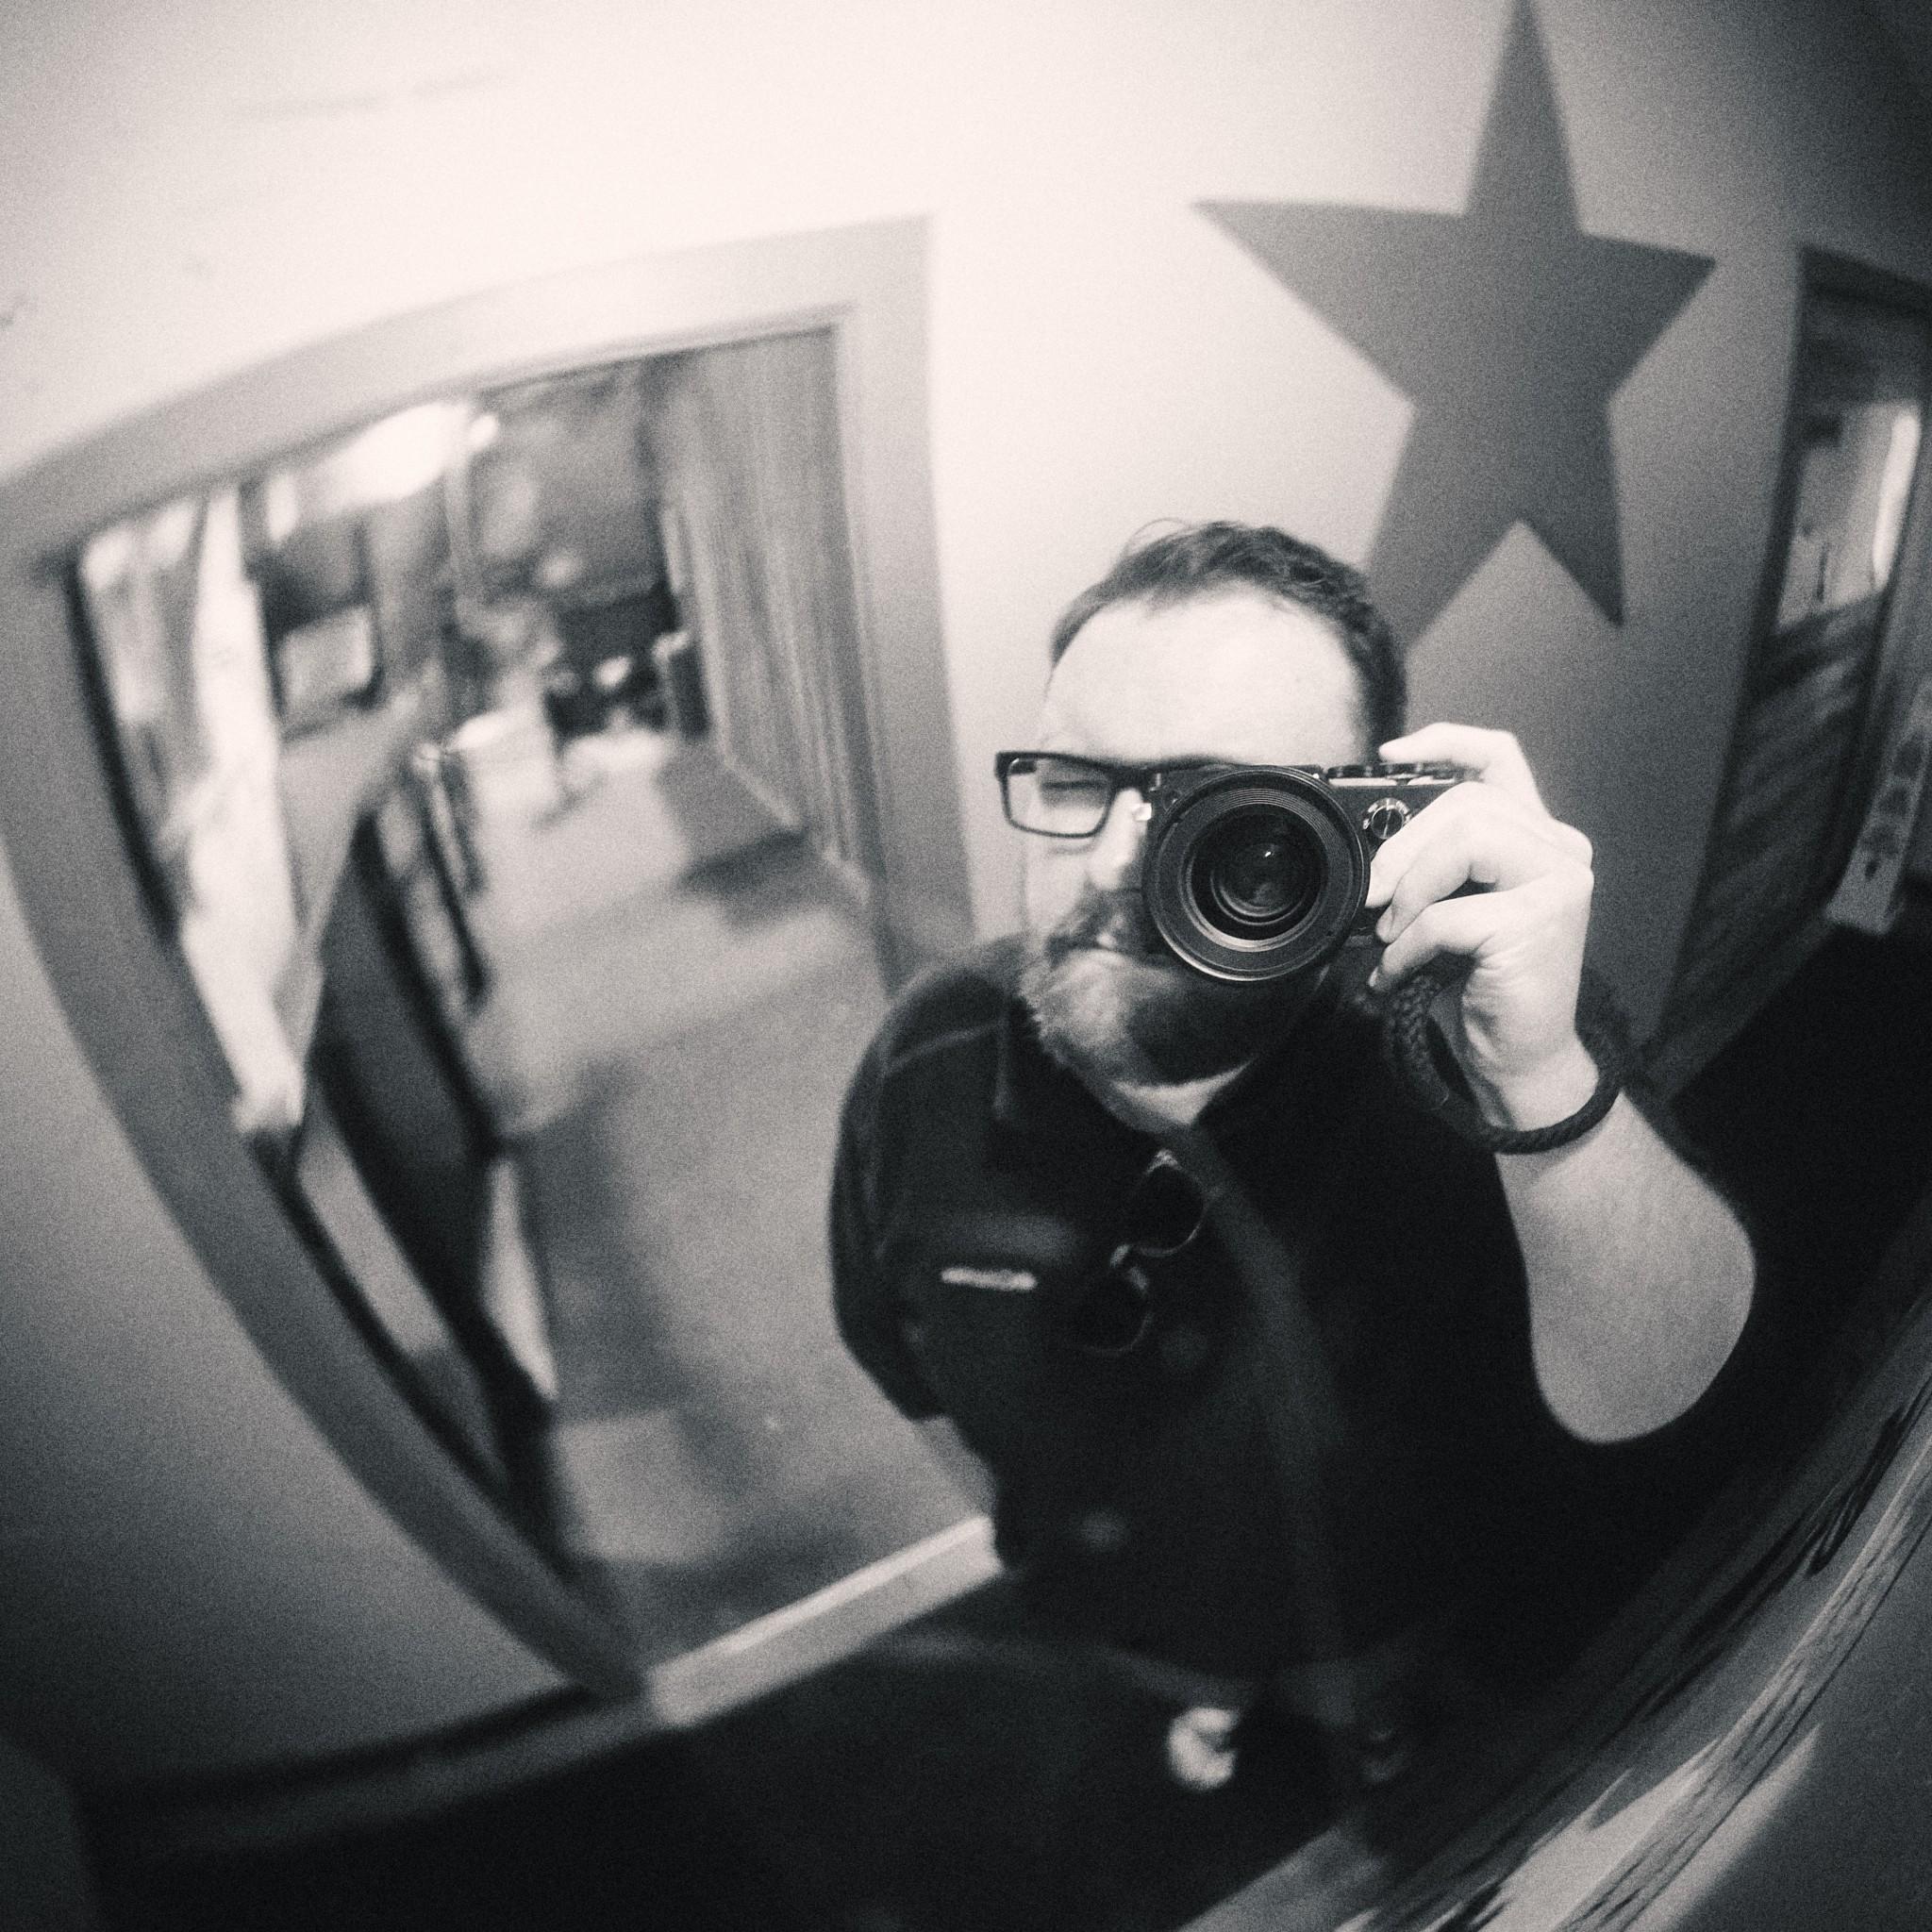 04-ROGUE-Mirror-Shot-2019.jpg